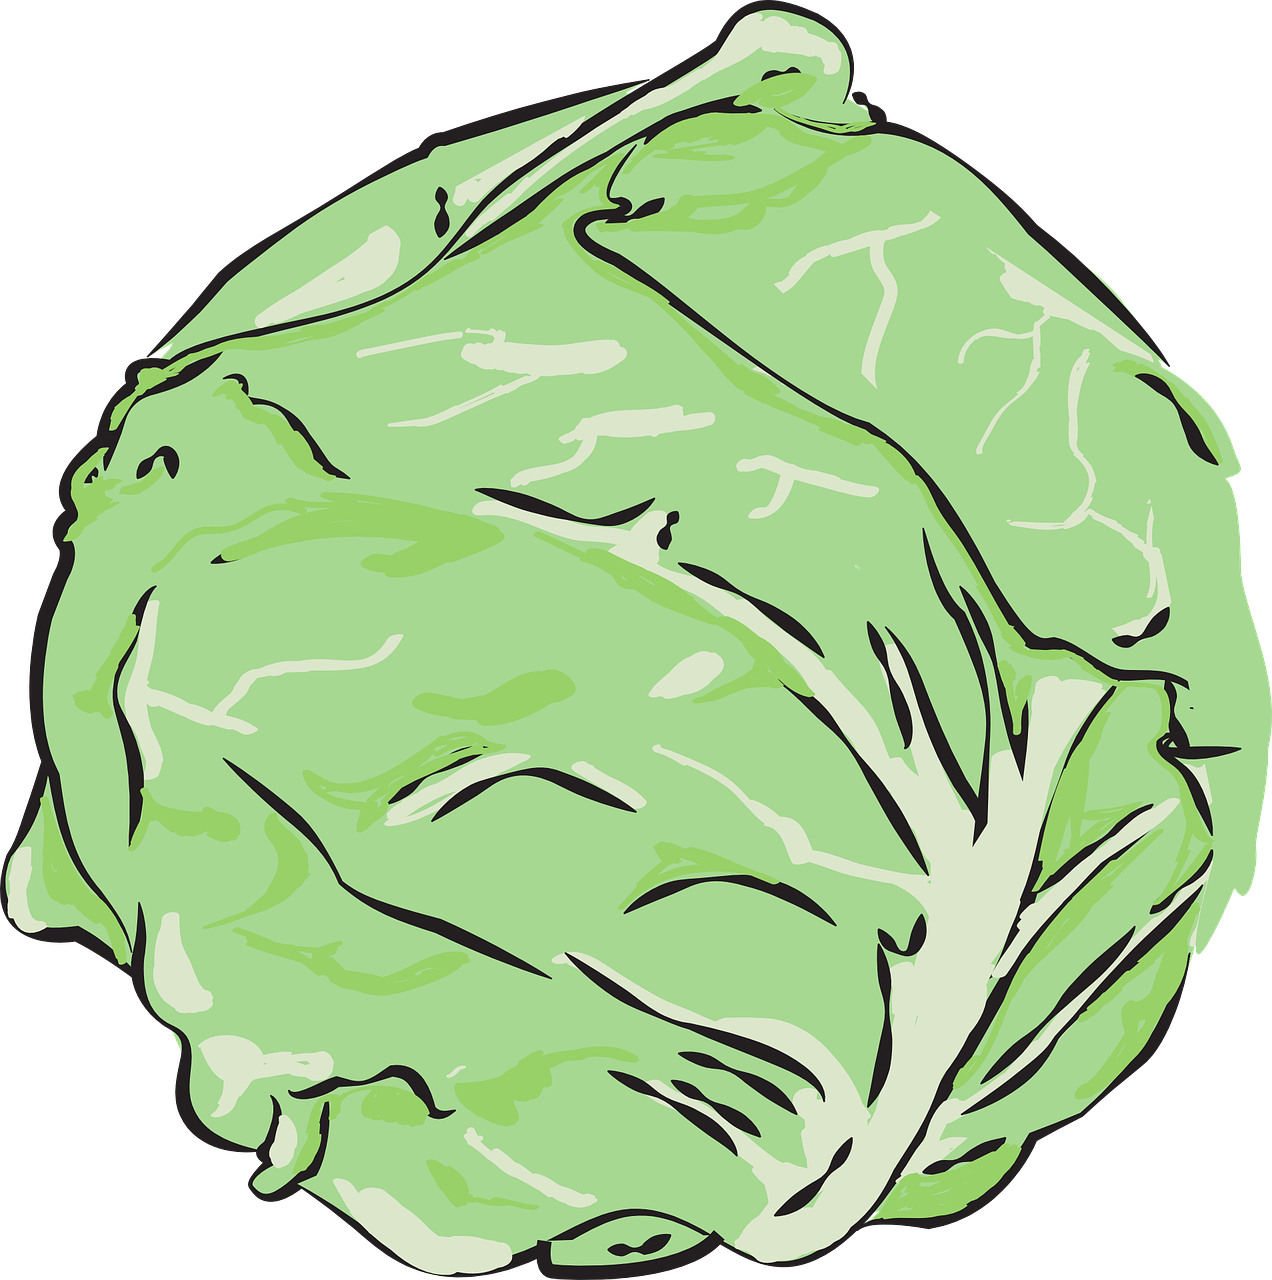 cabbage-559887_1280